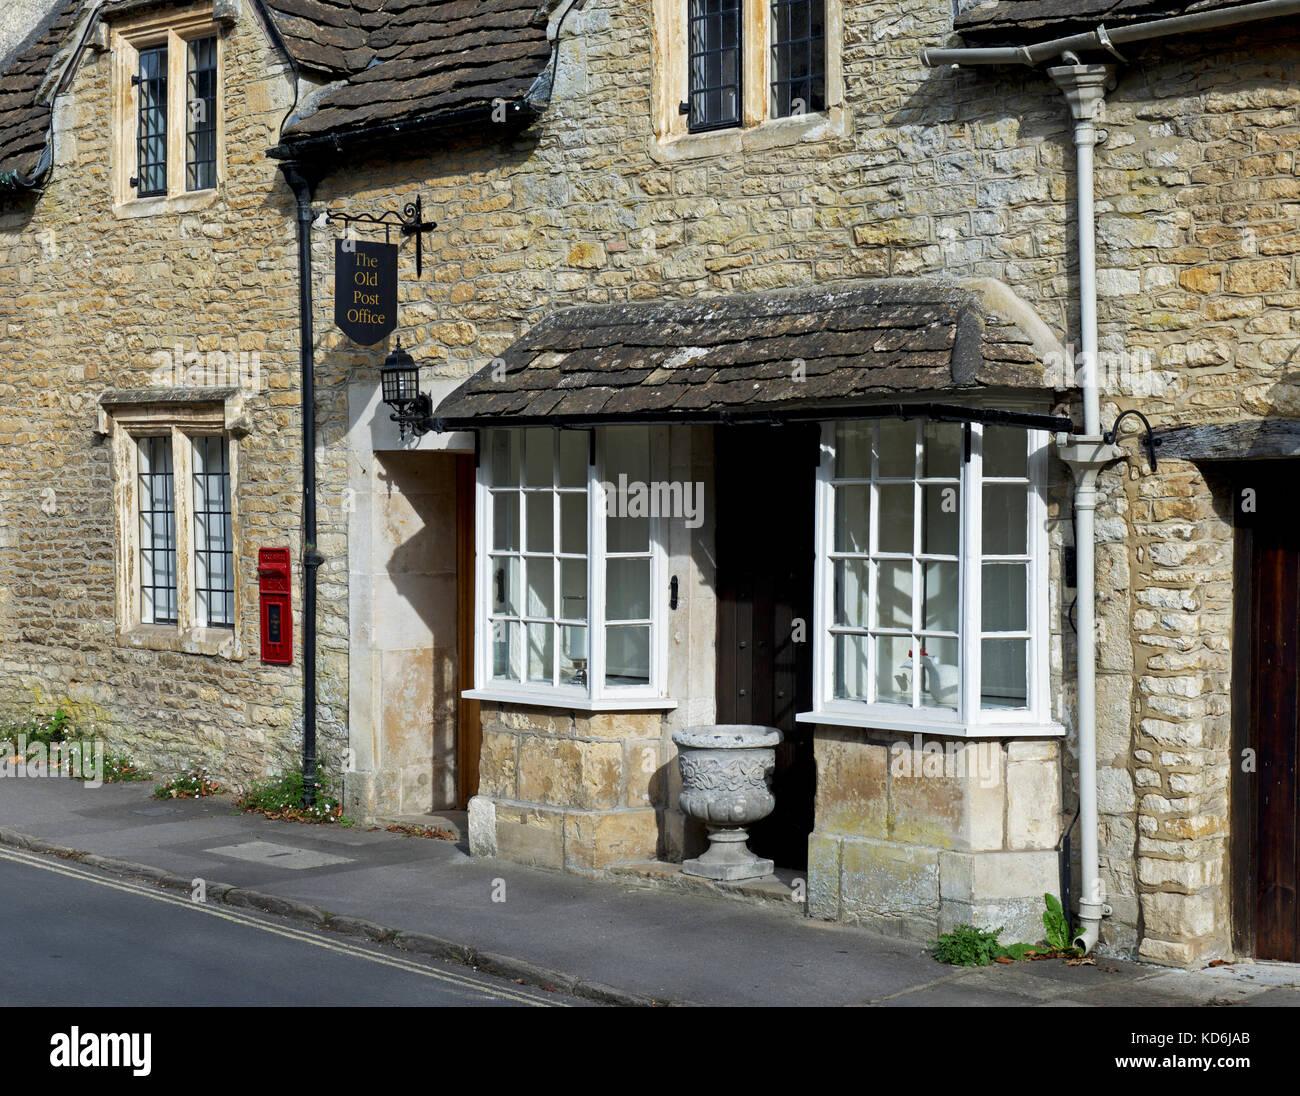 Castle Combe, Wiltshire, England UK - Stock Image